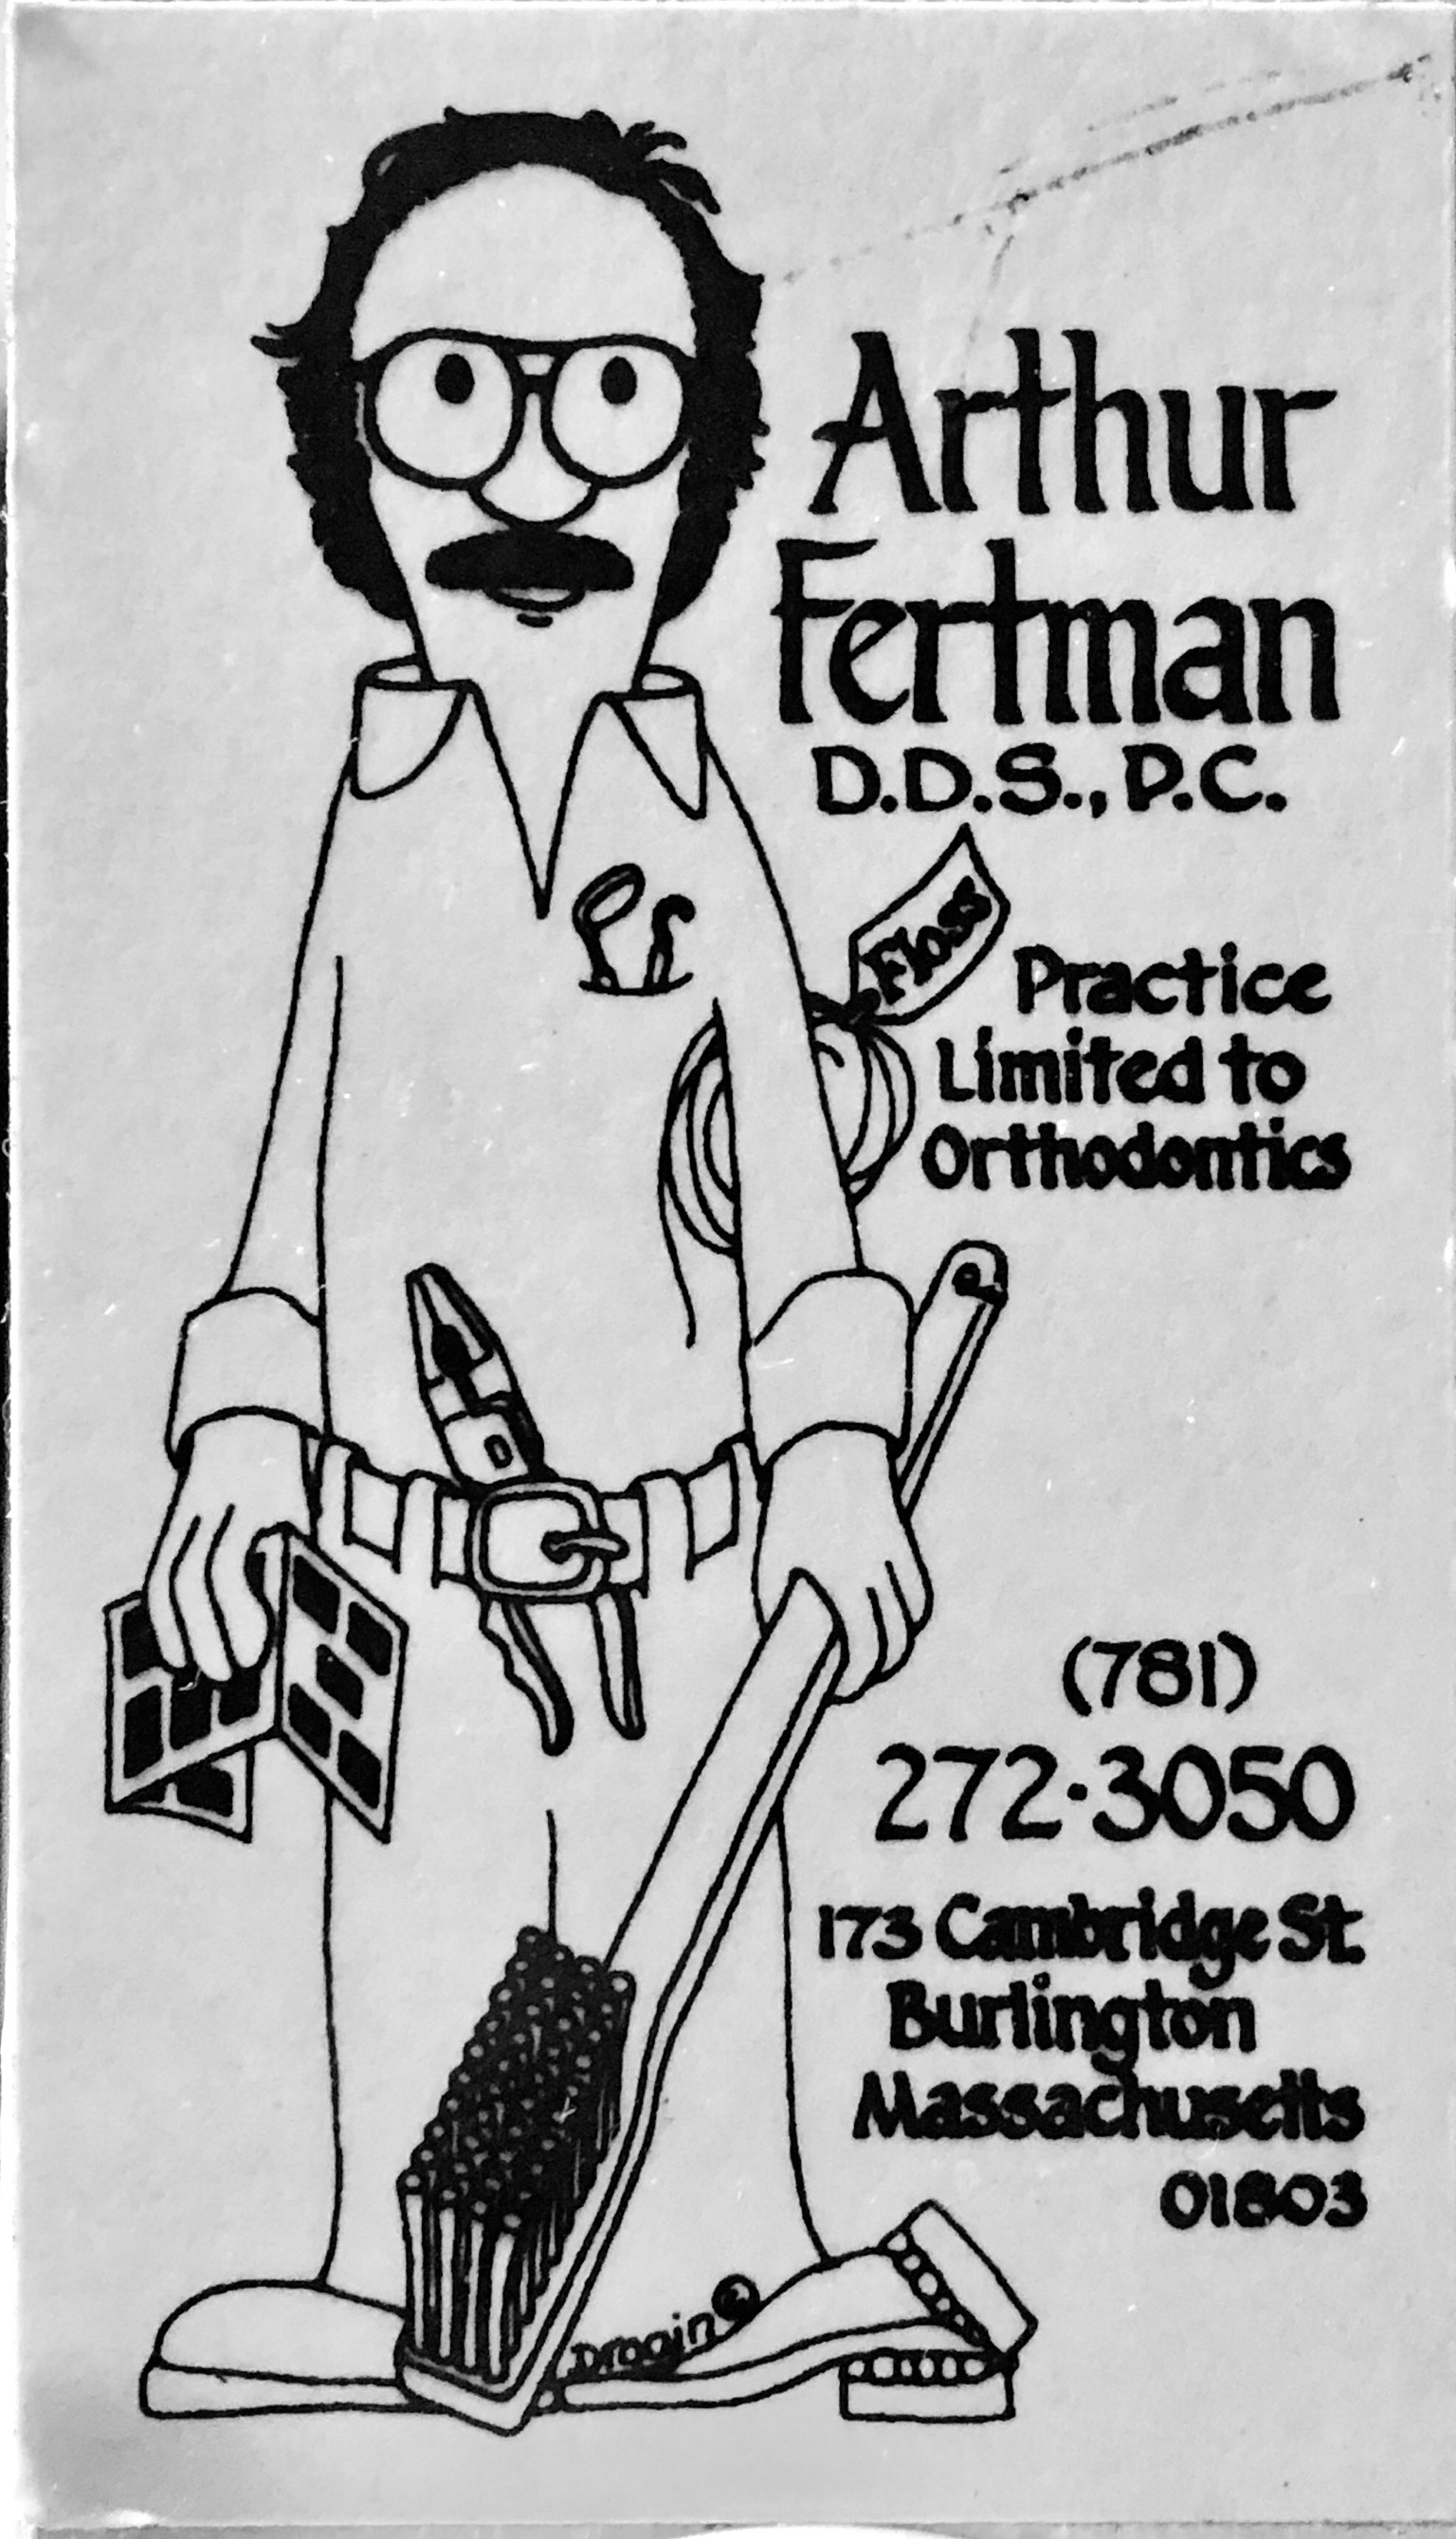 Dr. Arthur Fertman refrigerator magnet